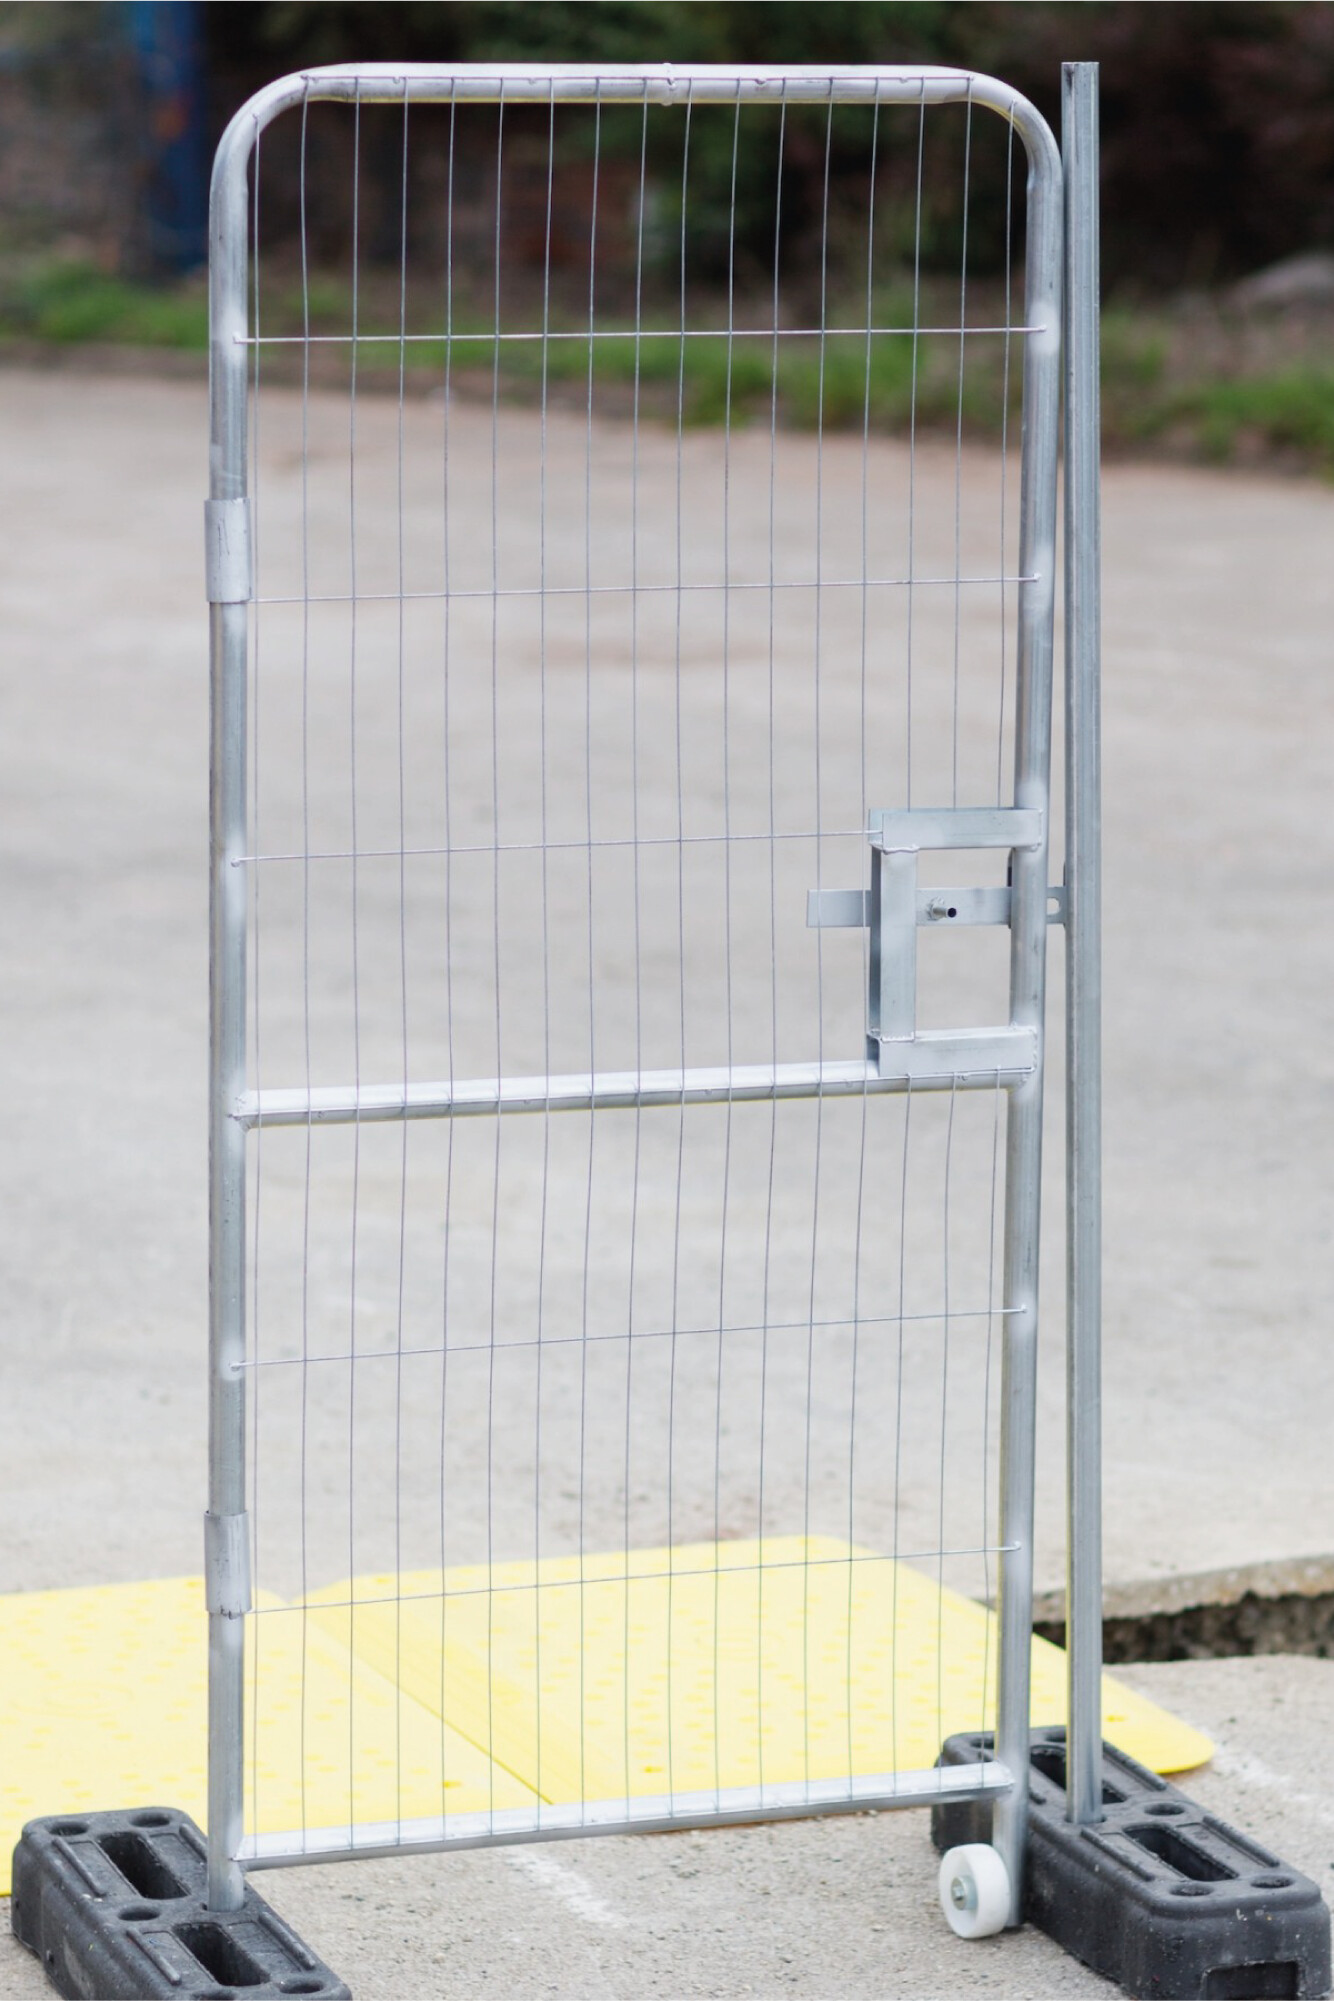 Mesh Pedestrian Gate